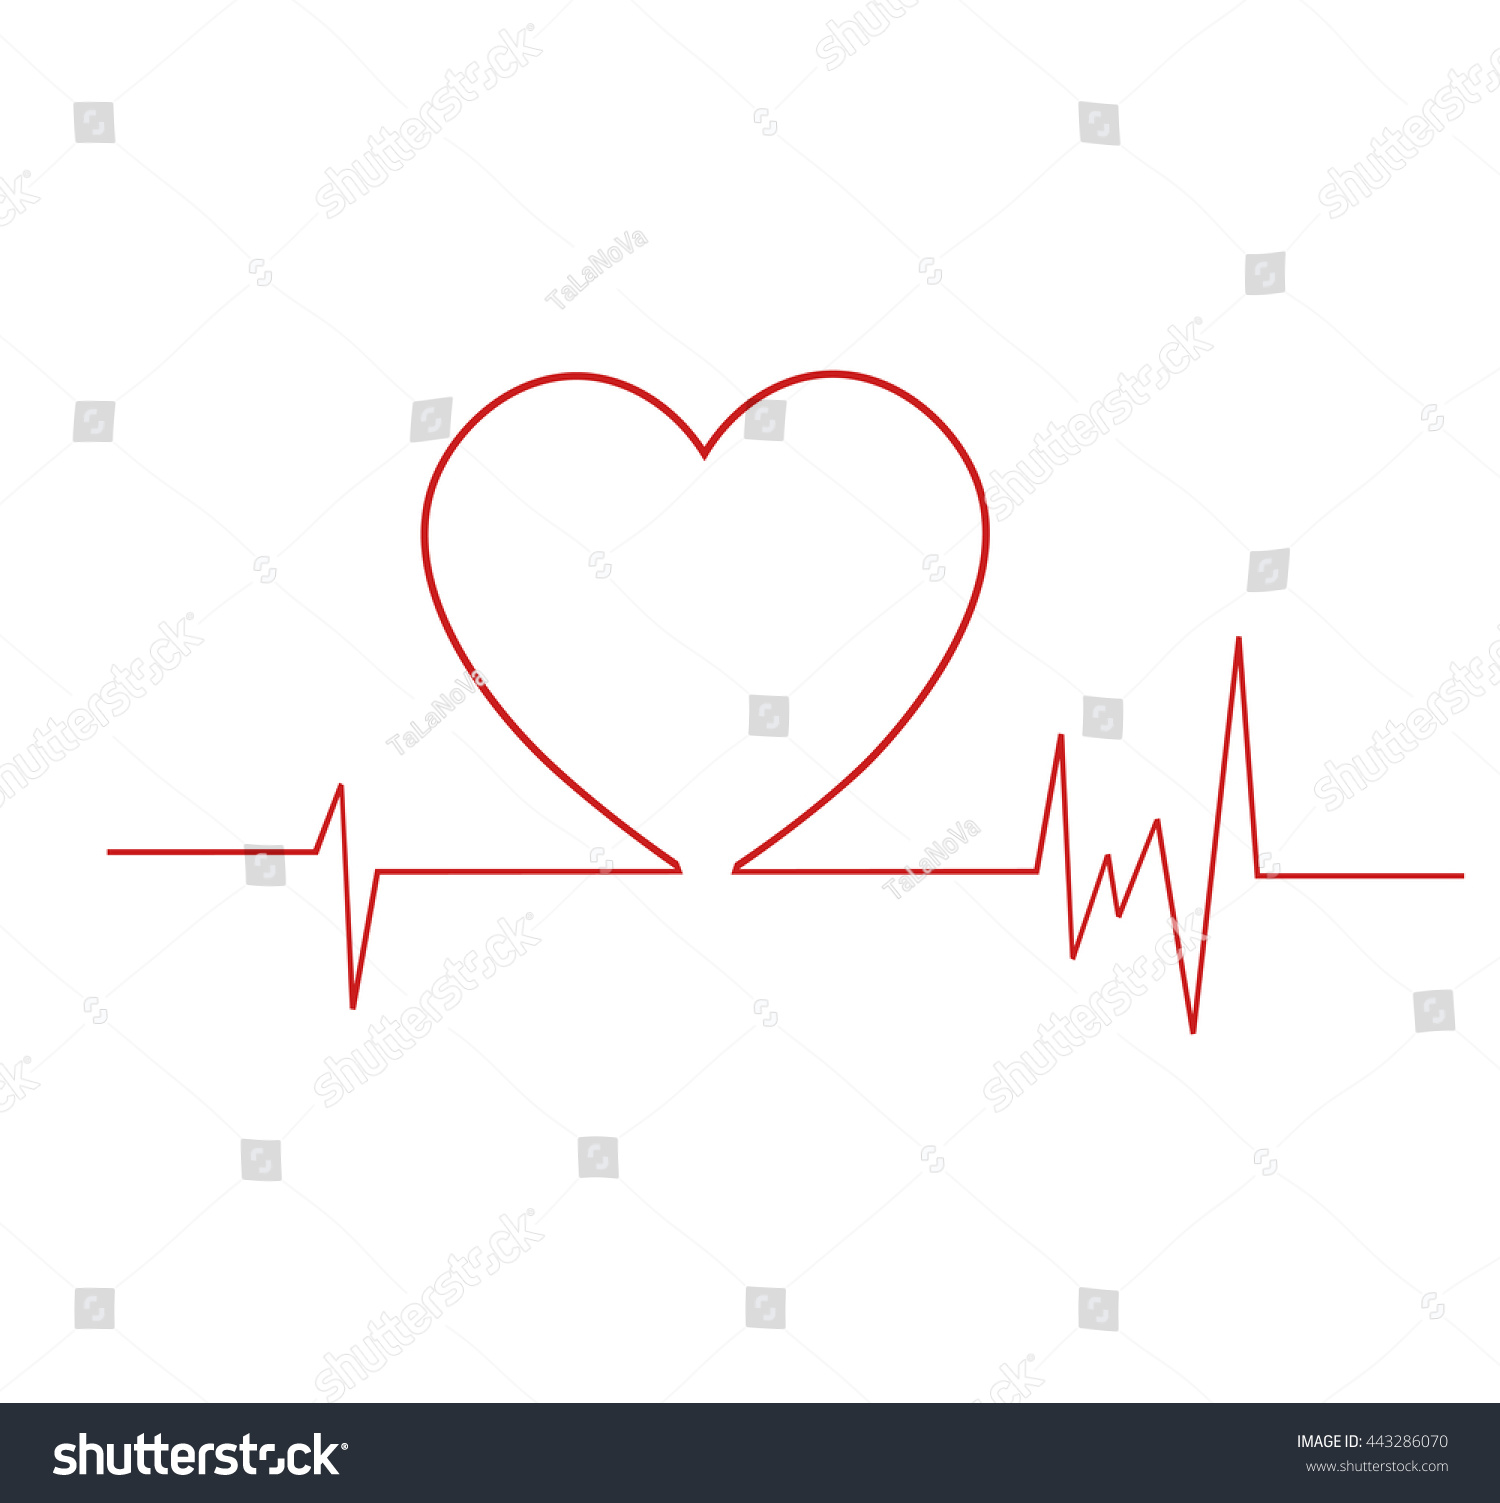 Royalty Free Heart Cardiogram Life Line Symbol 443286070 Stock